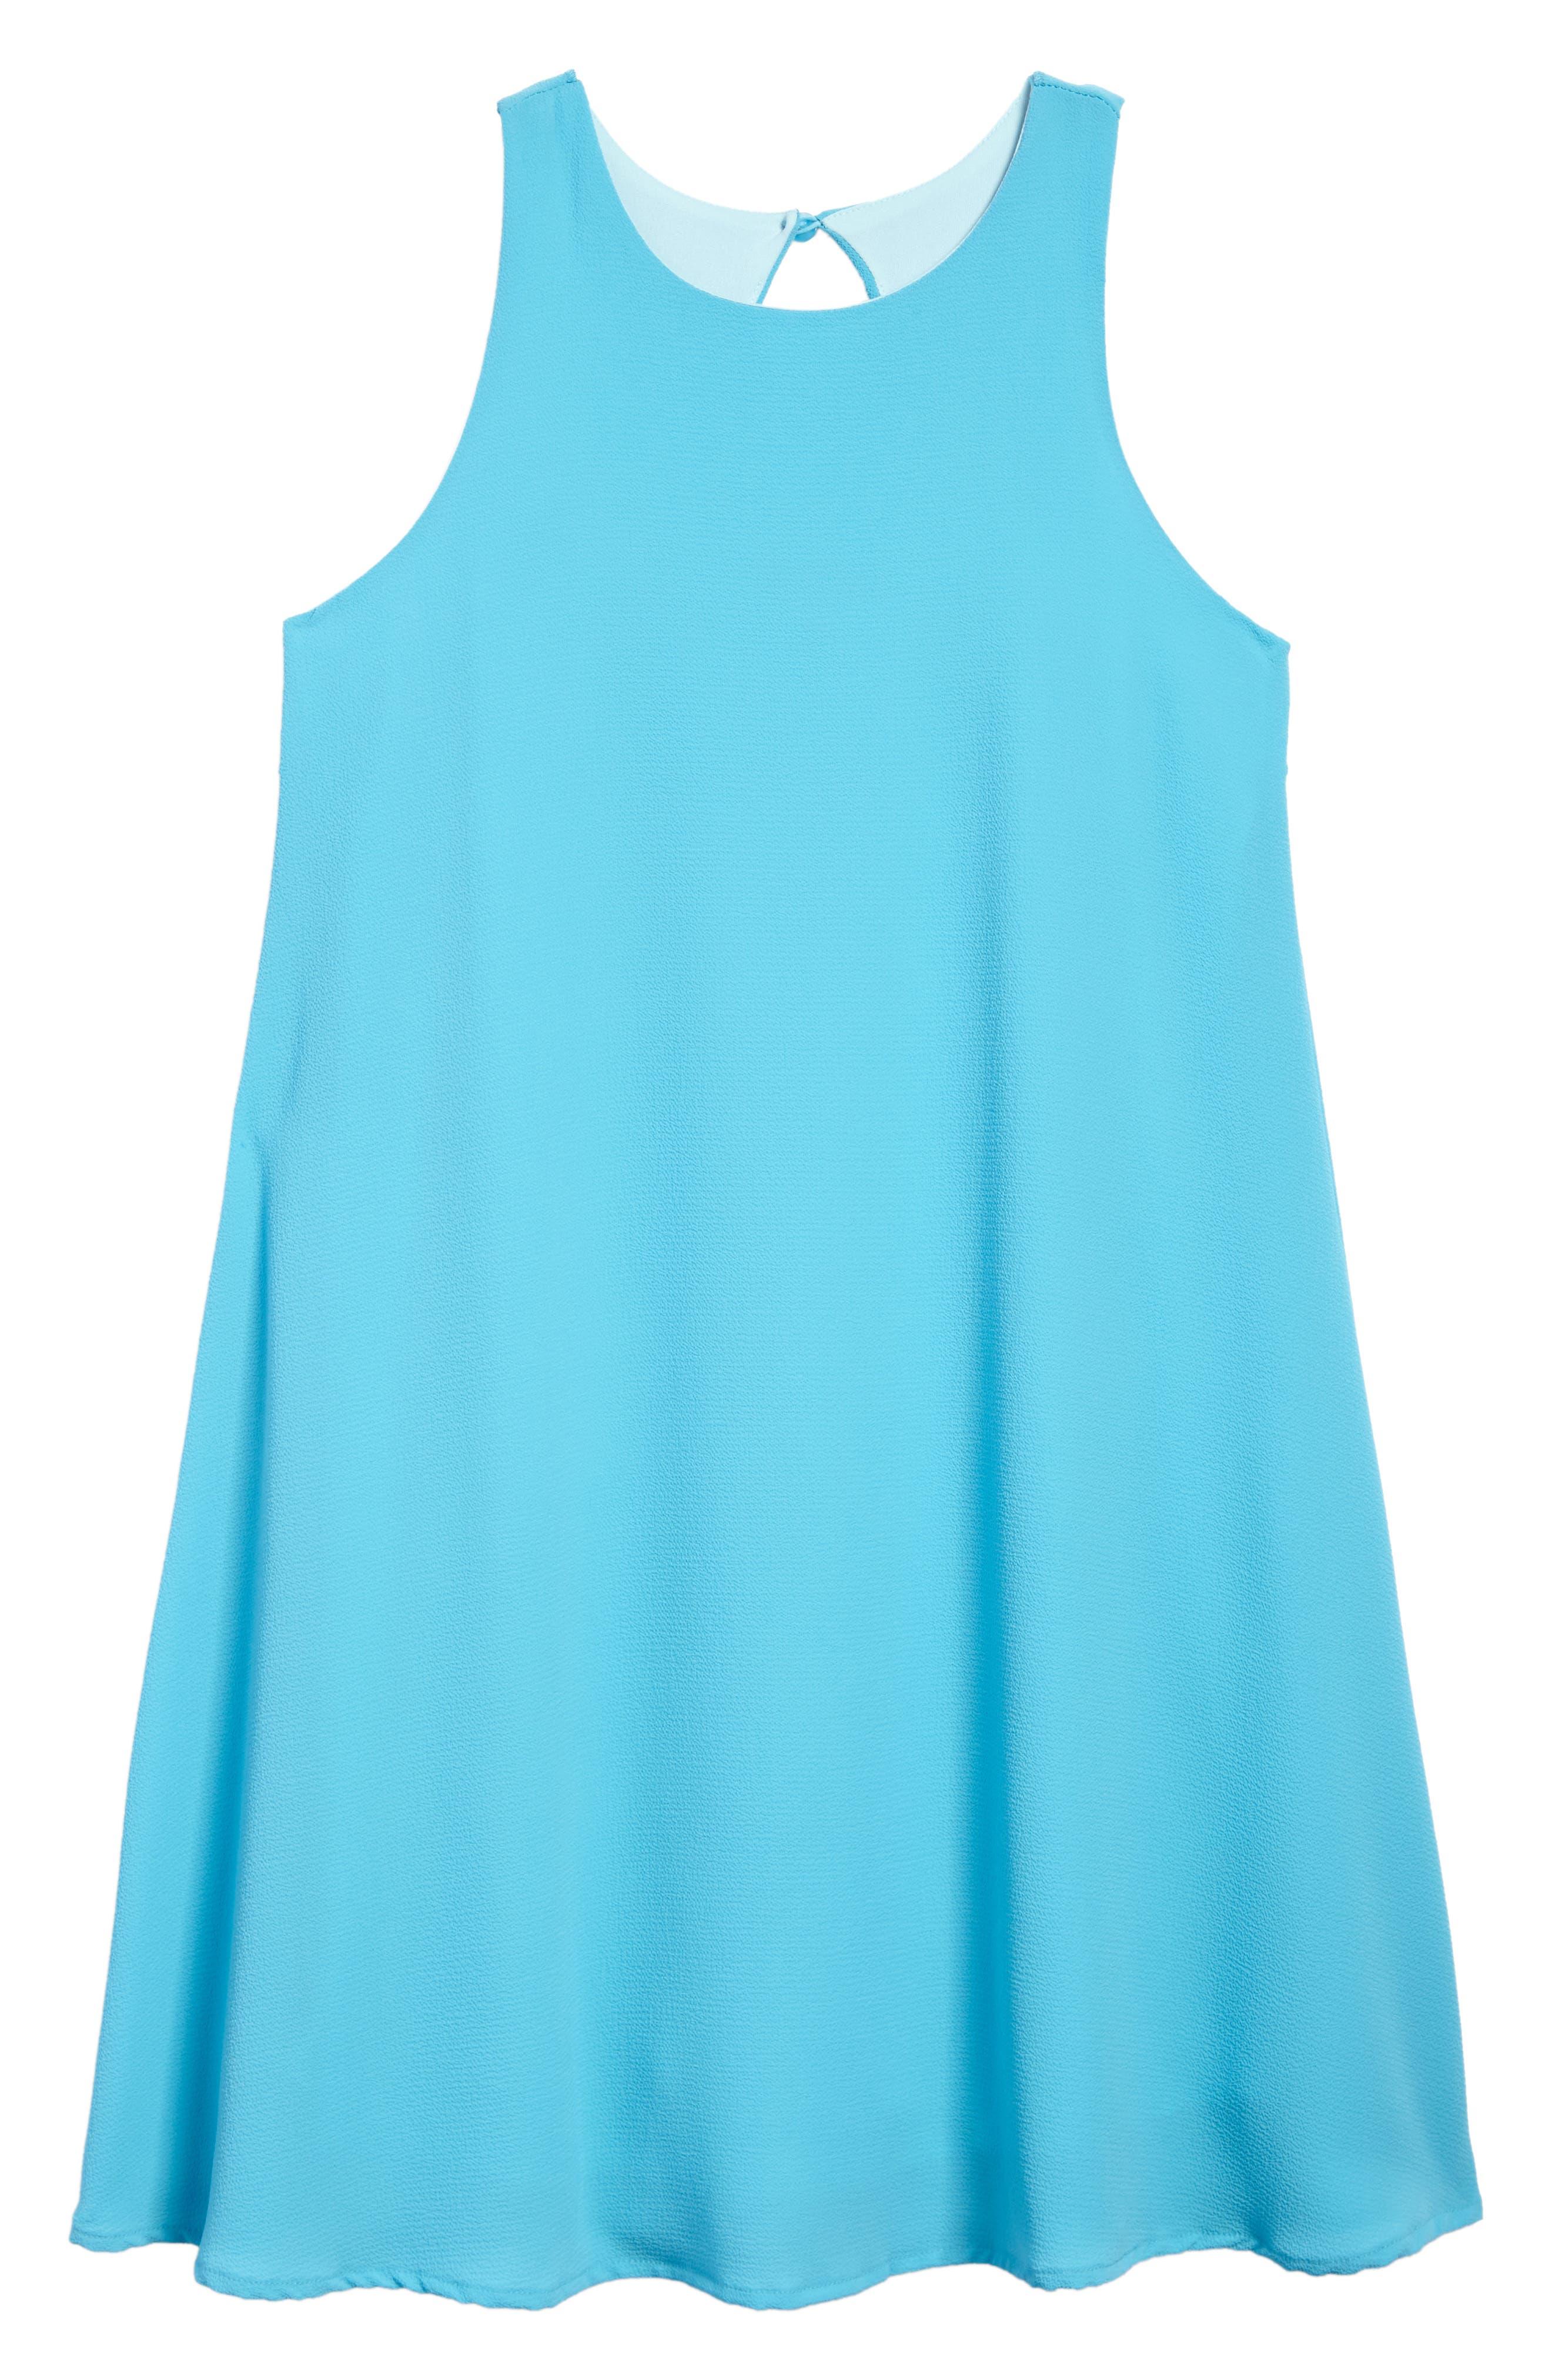 Ruffle Trapeze Dress,                             Main thumbnail 1, color,                             430